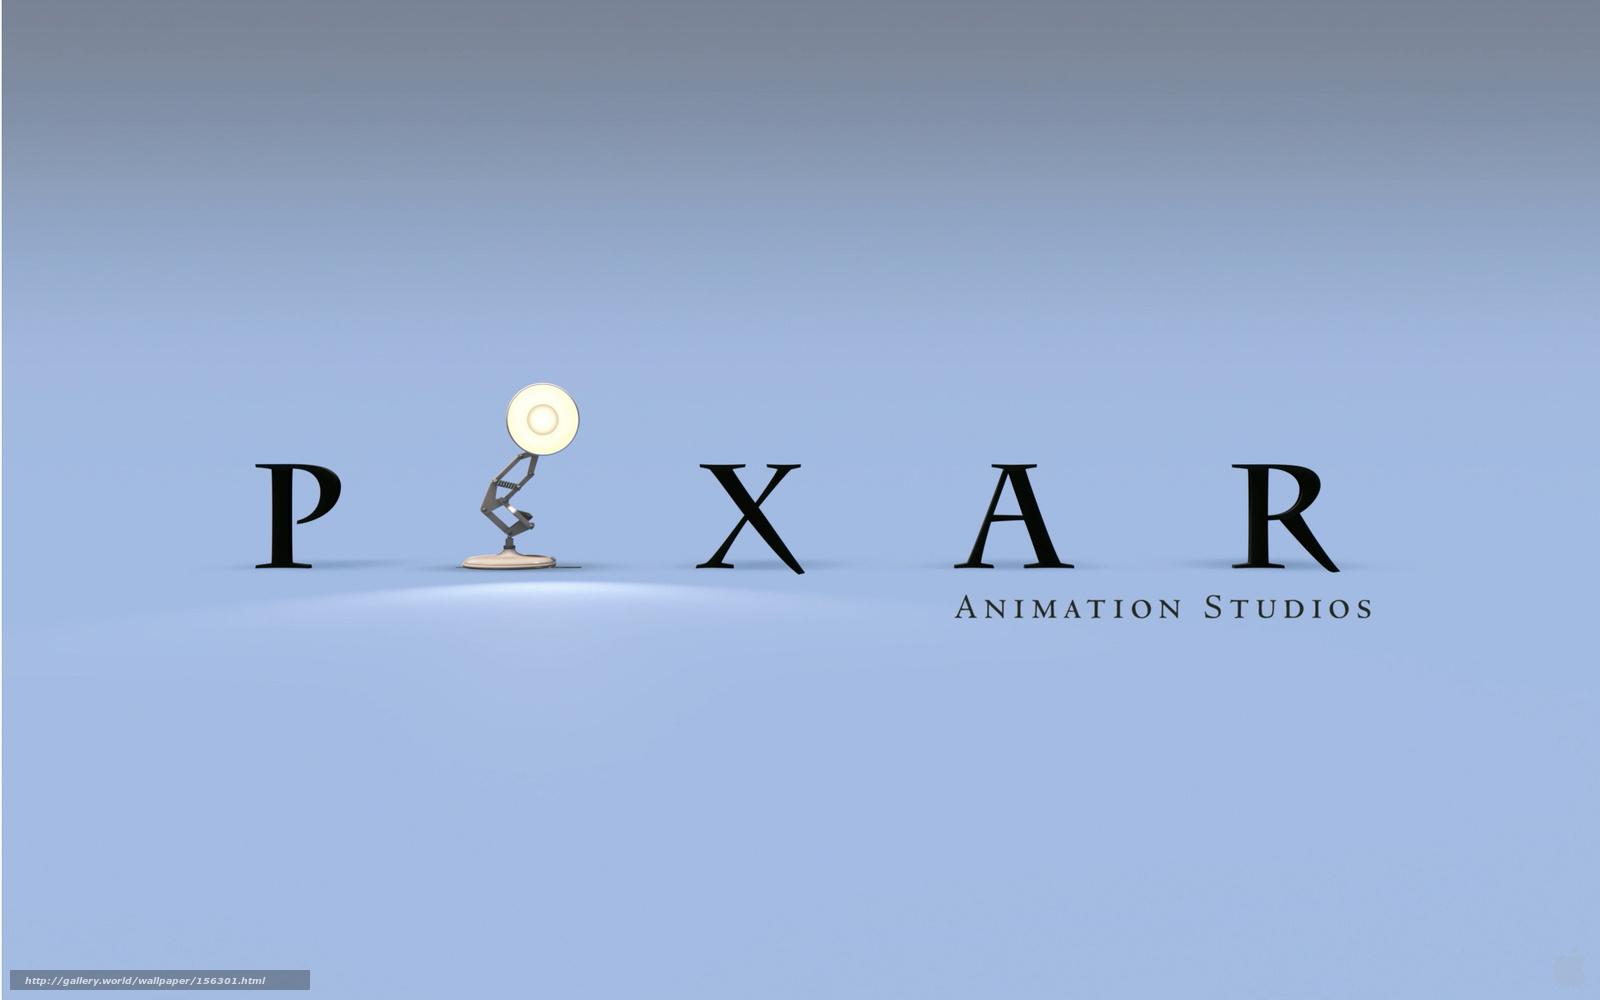 Tlcharger fond d 39 ecran pixar logo animation fonds d for Fond ecran animation